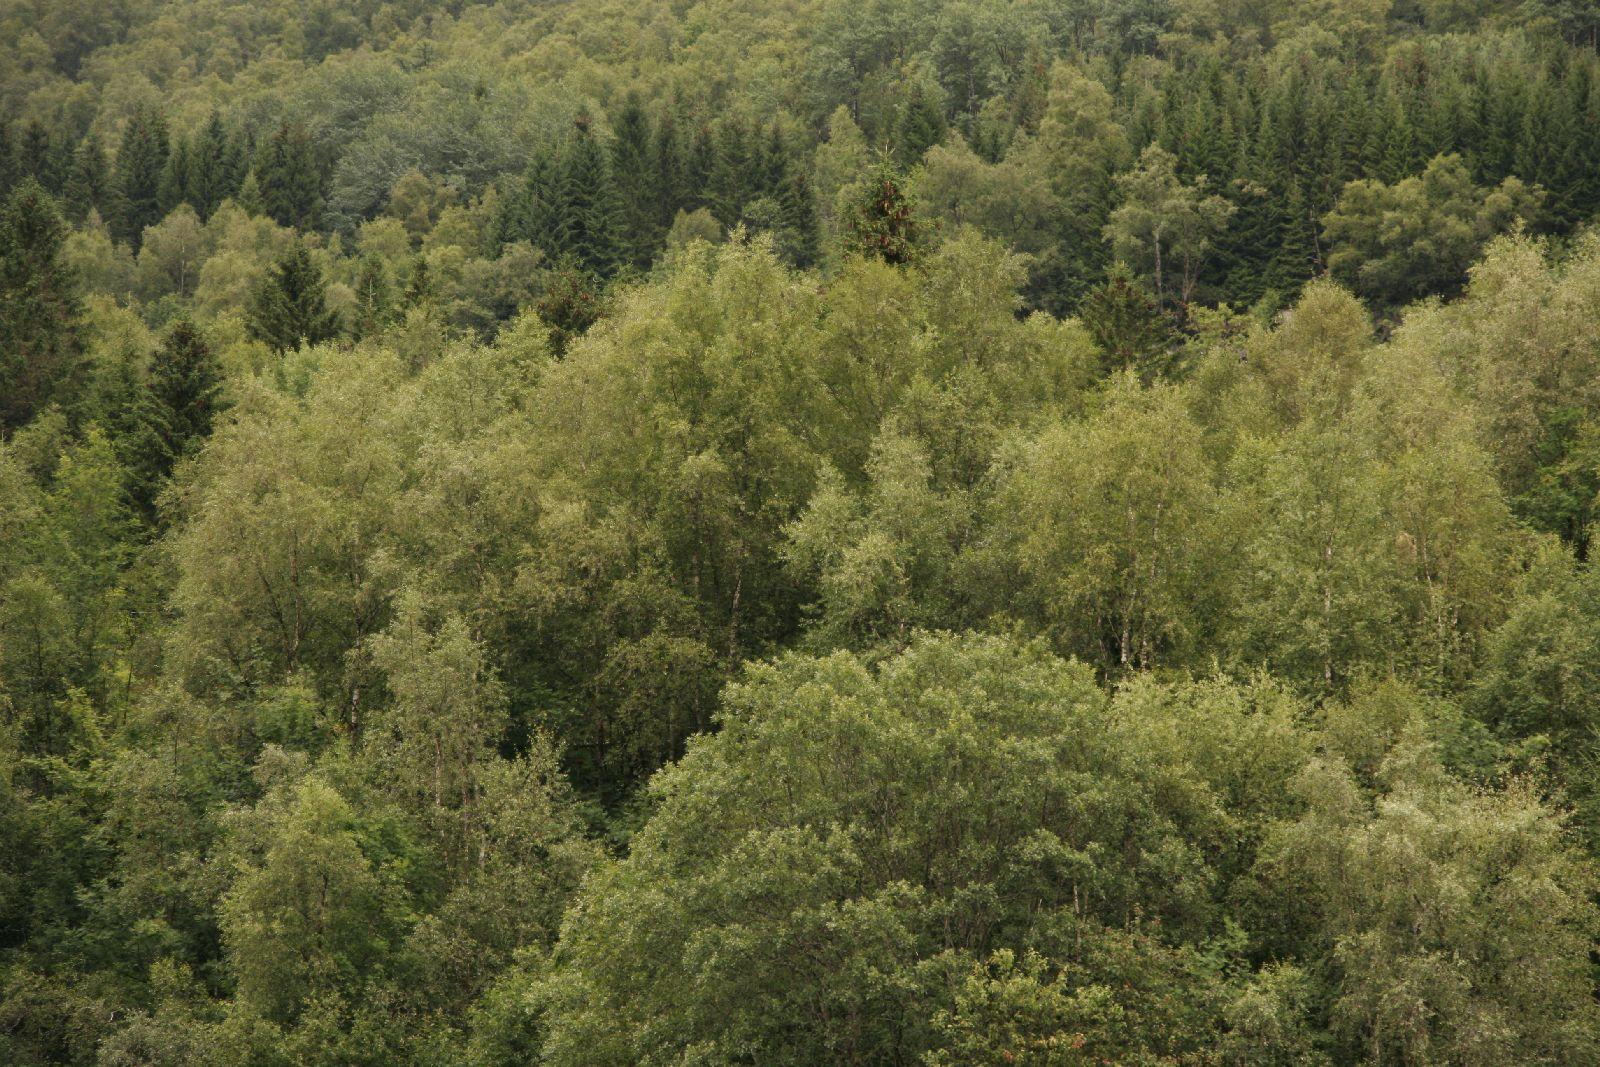 Pflanzen-Baum-Foto_Textur_B__MG_2616